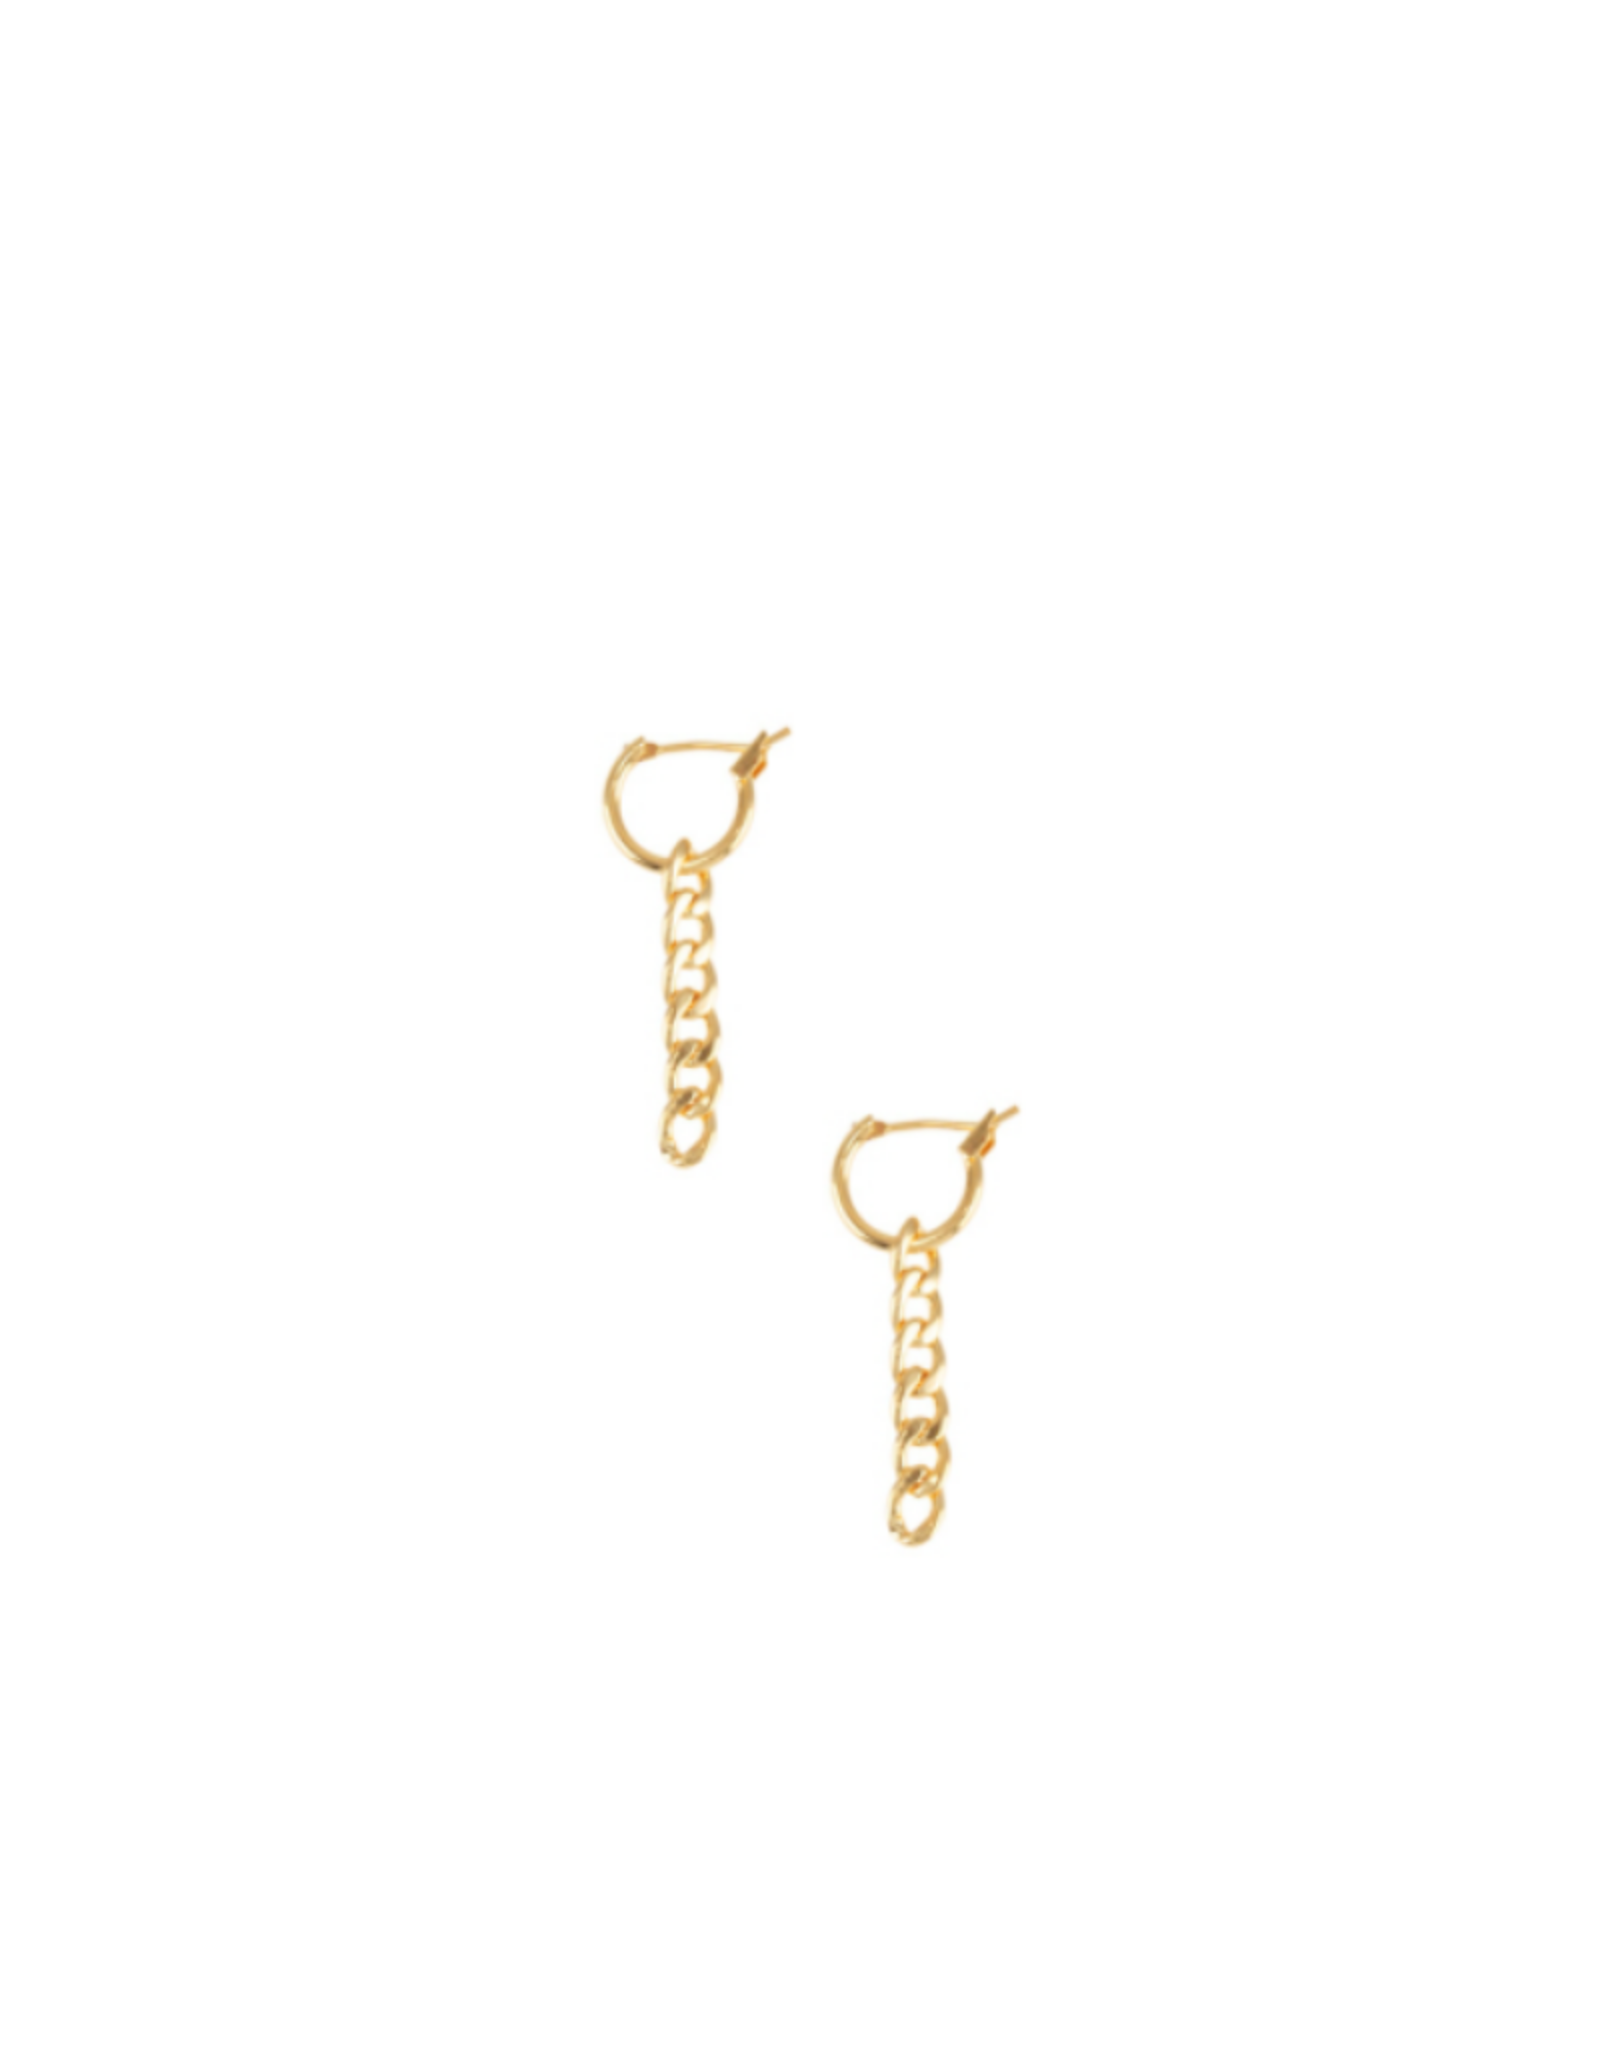 EARRINGS-GOLD DIPPED SM HOOP W/CHAIN